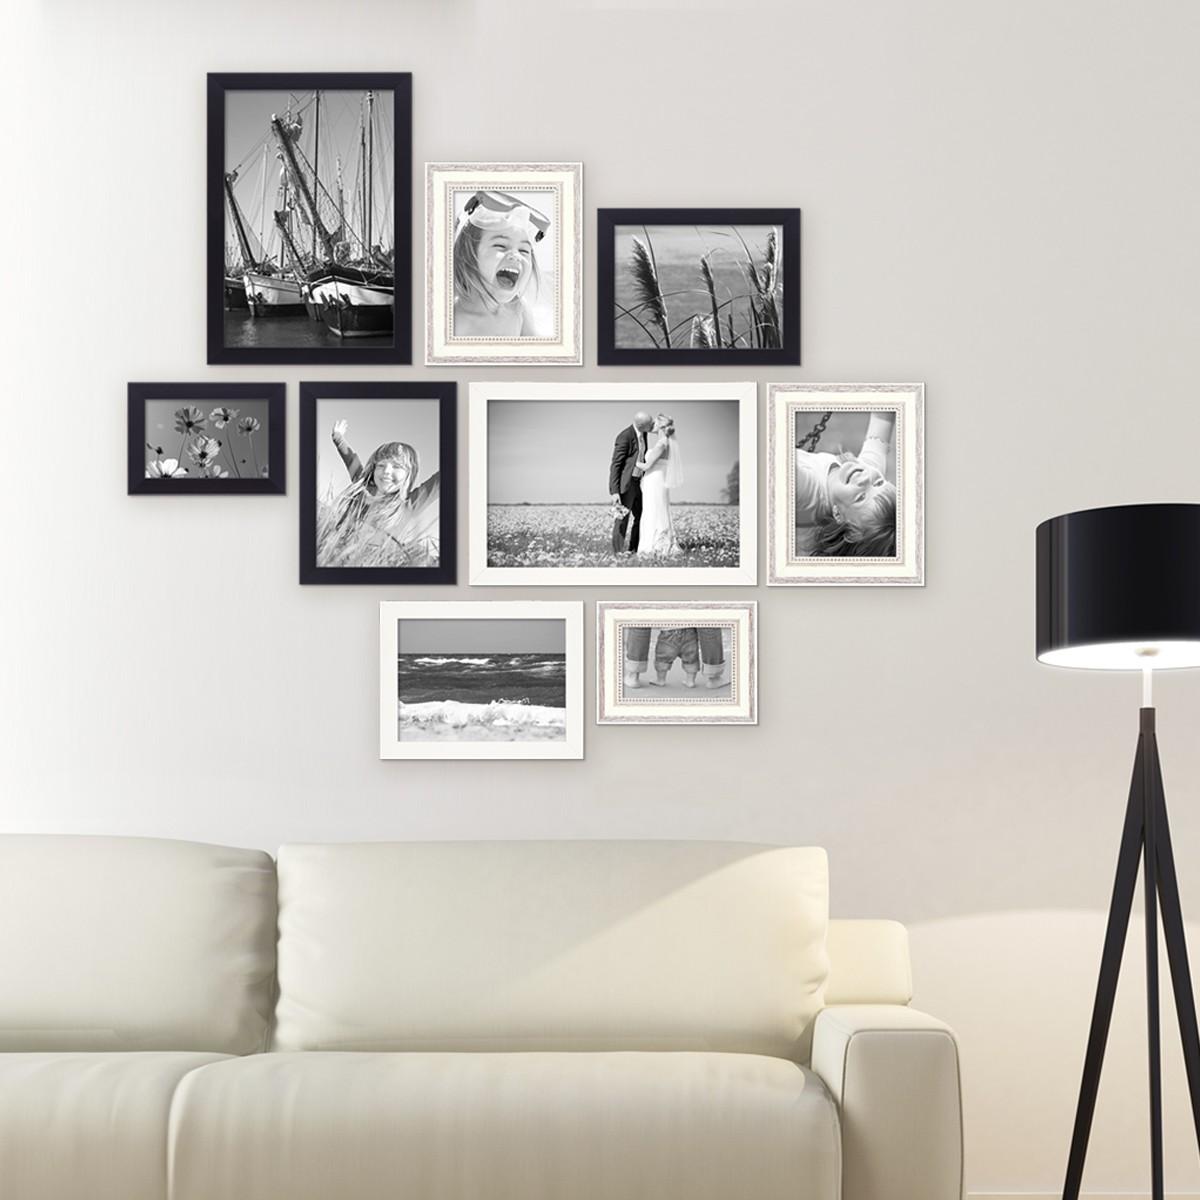 9er set bilderrahmen f r grosse bilderwand modern shabby chic 10x15 bis 20x30 cm inklusive. Black Bedroom Furniture Sets. Home Design Ideas